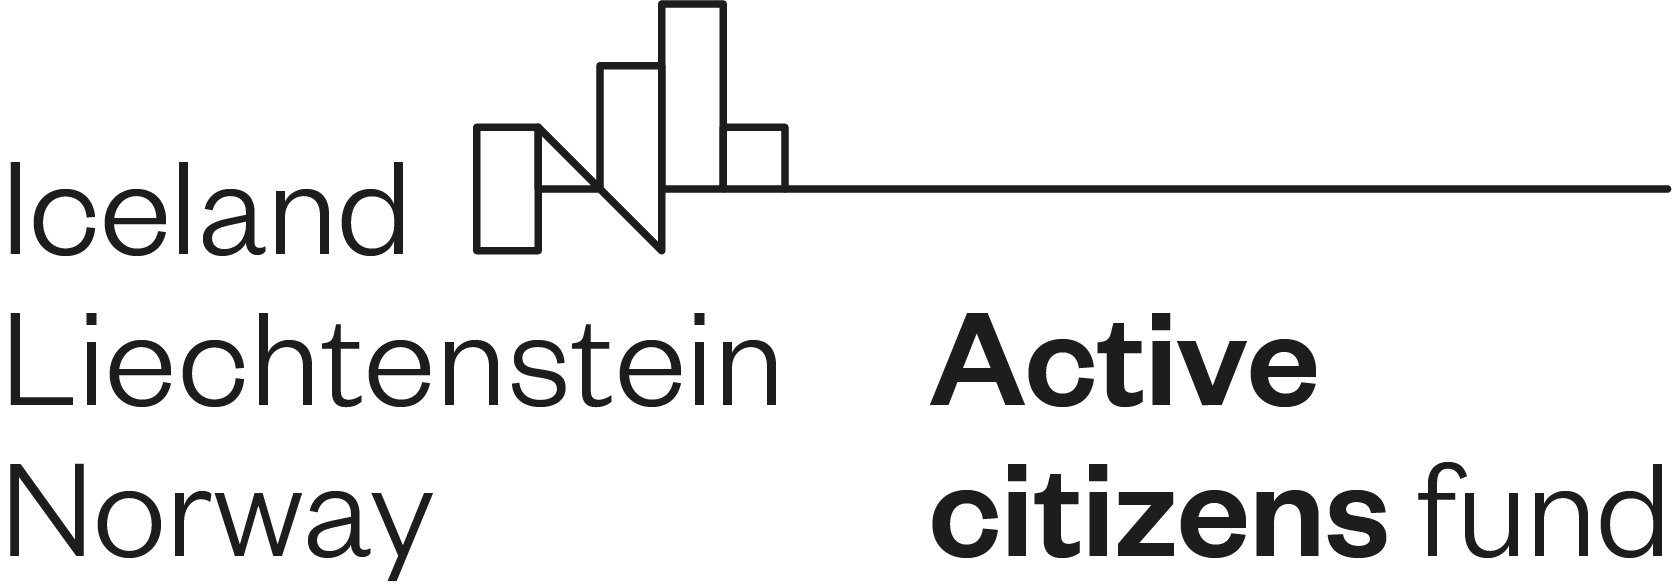 Active-citizens-fund@2x